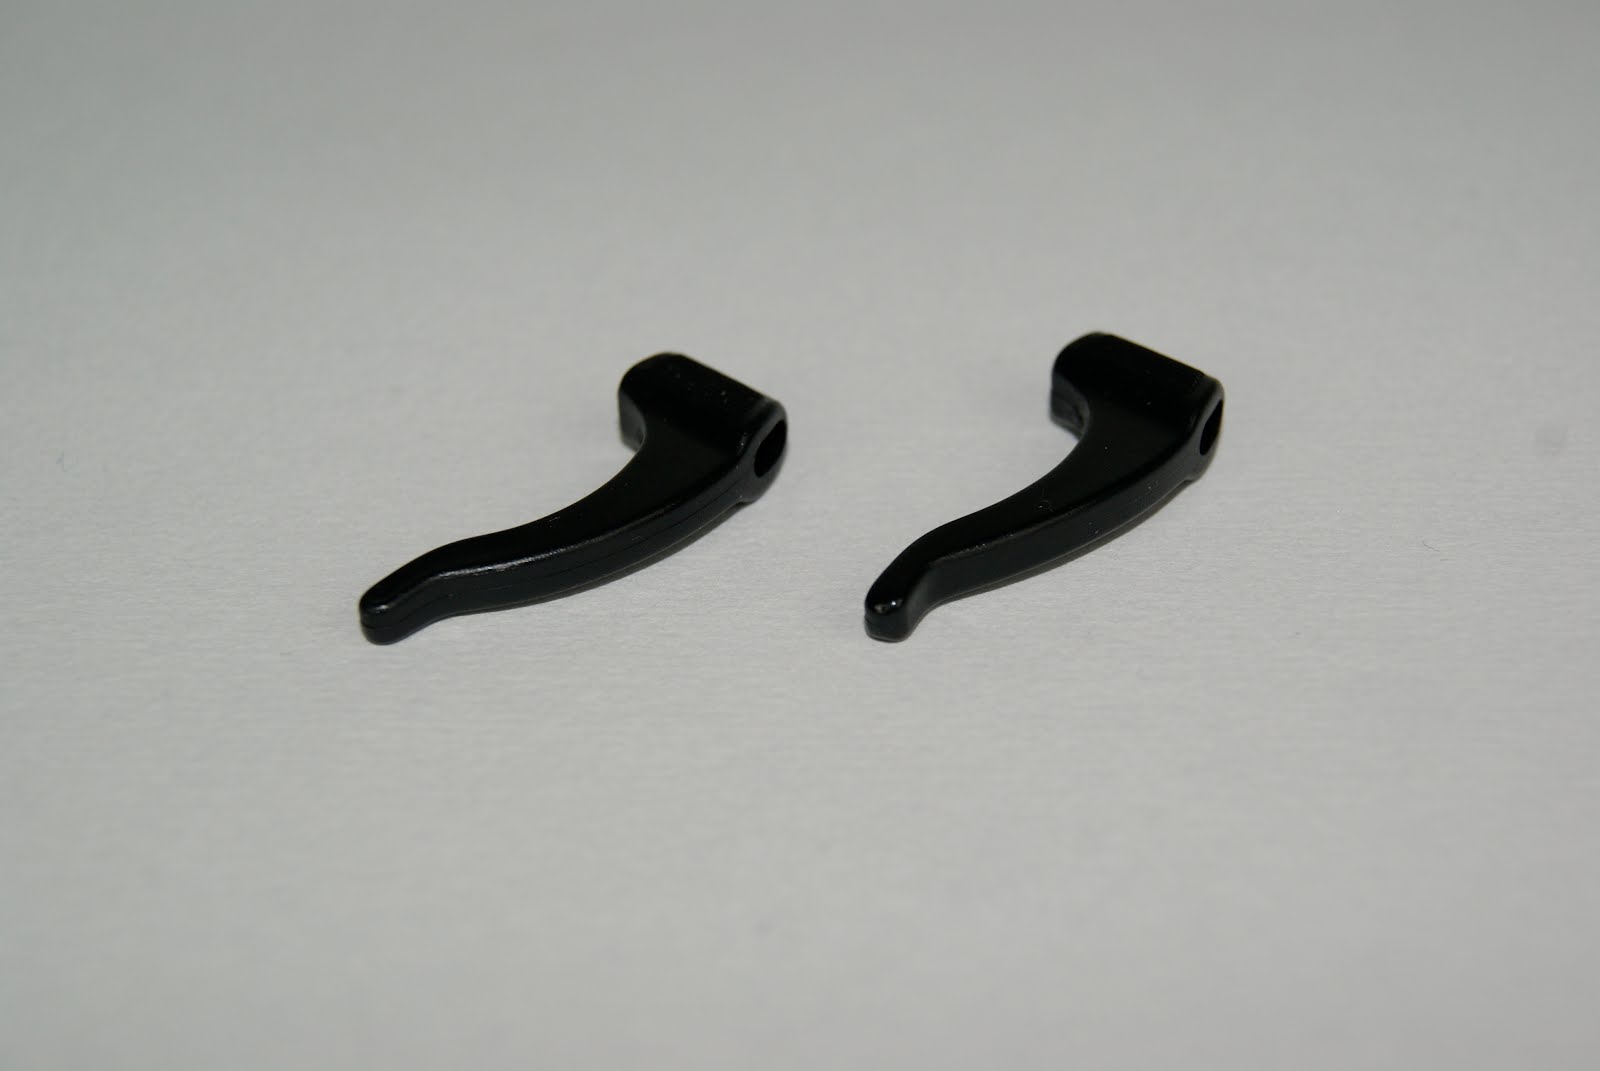 Eyeglass Frames Slipping : The Eyeglass Retainer Blog: March 2012